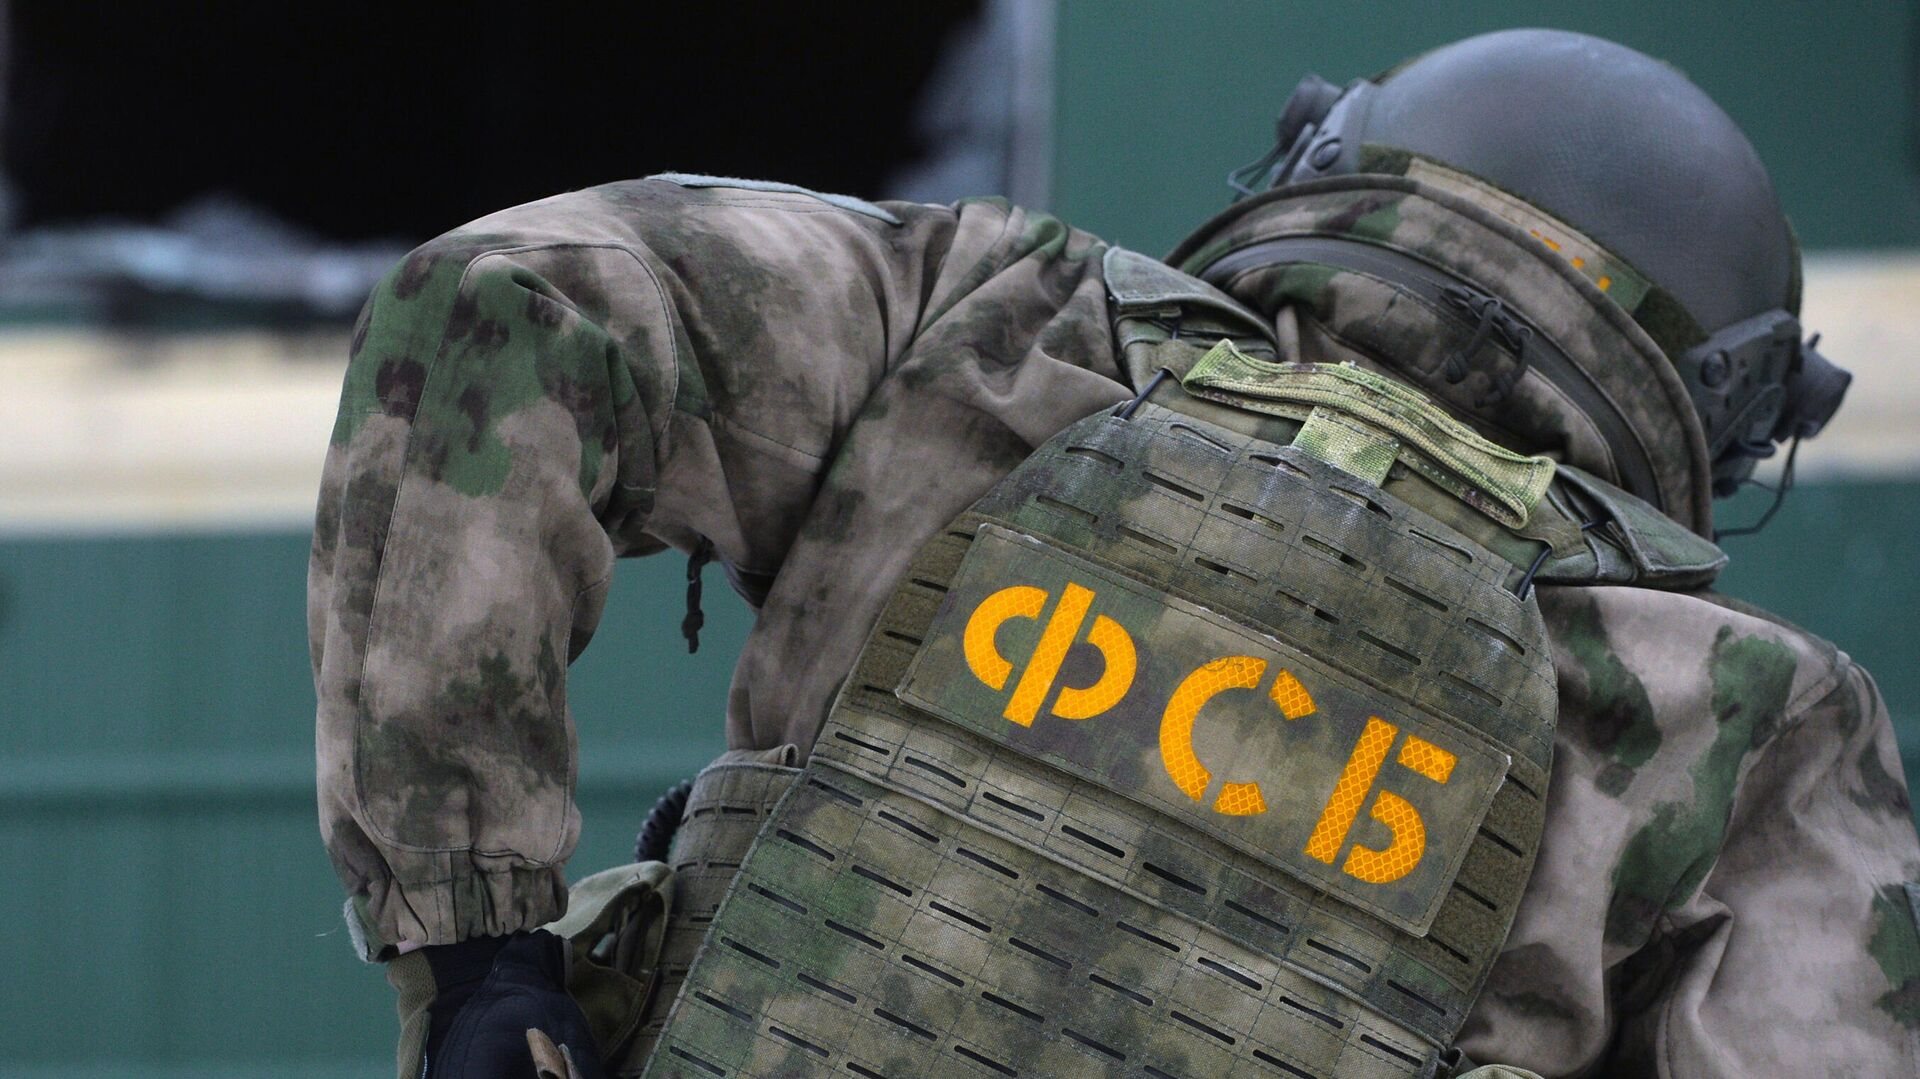 Сотрудник ФСБ - РИА Новости, 1920, 08.04.2021